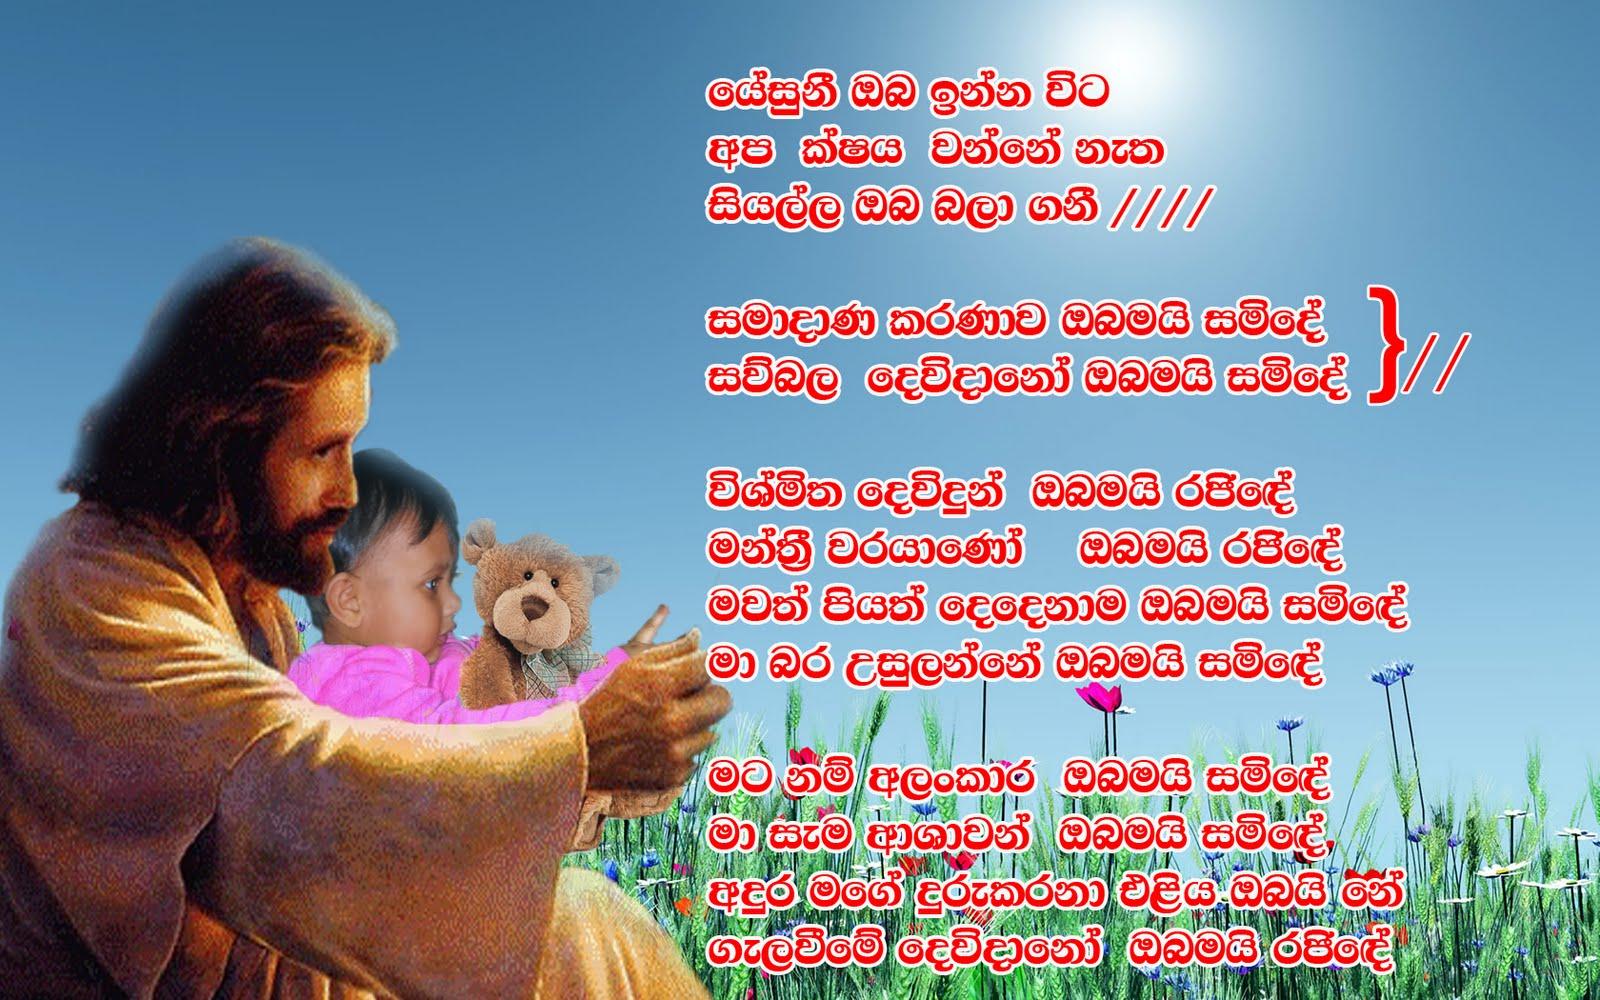 Sinhala Bible Verses